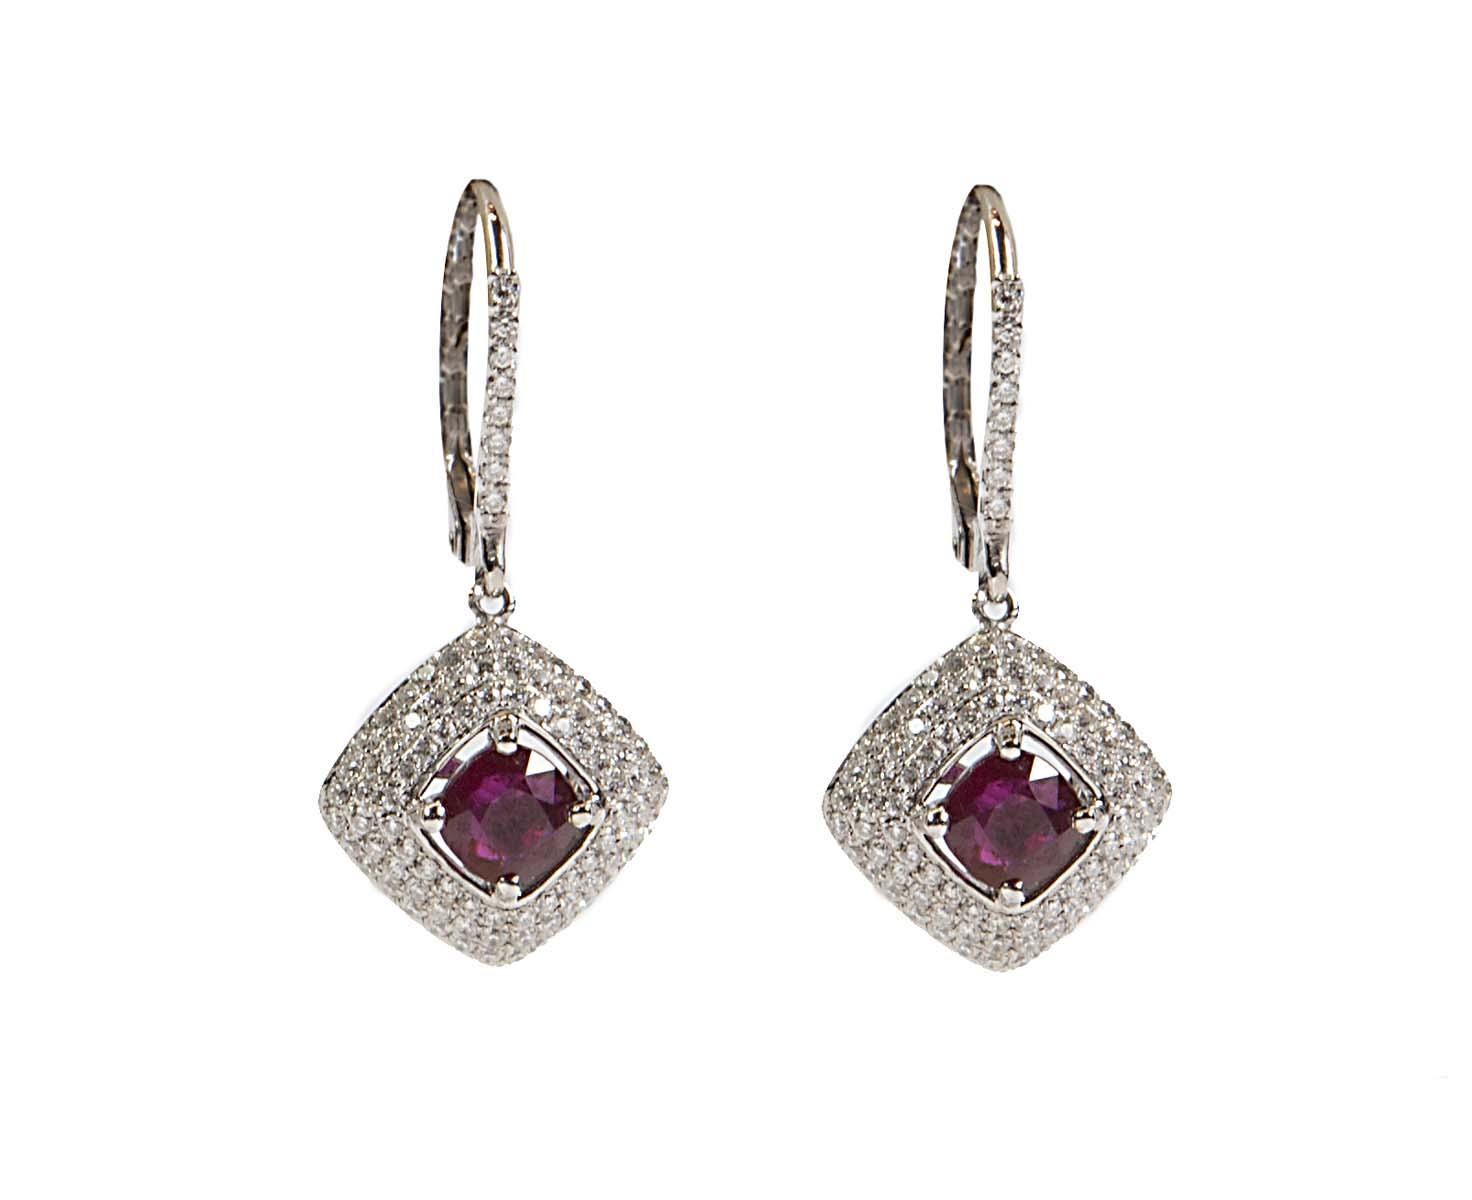 18k diamond and ruby drop earrings